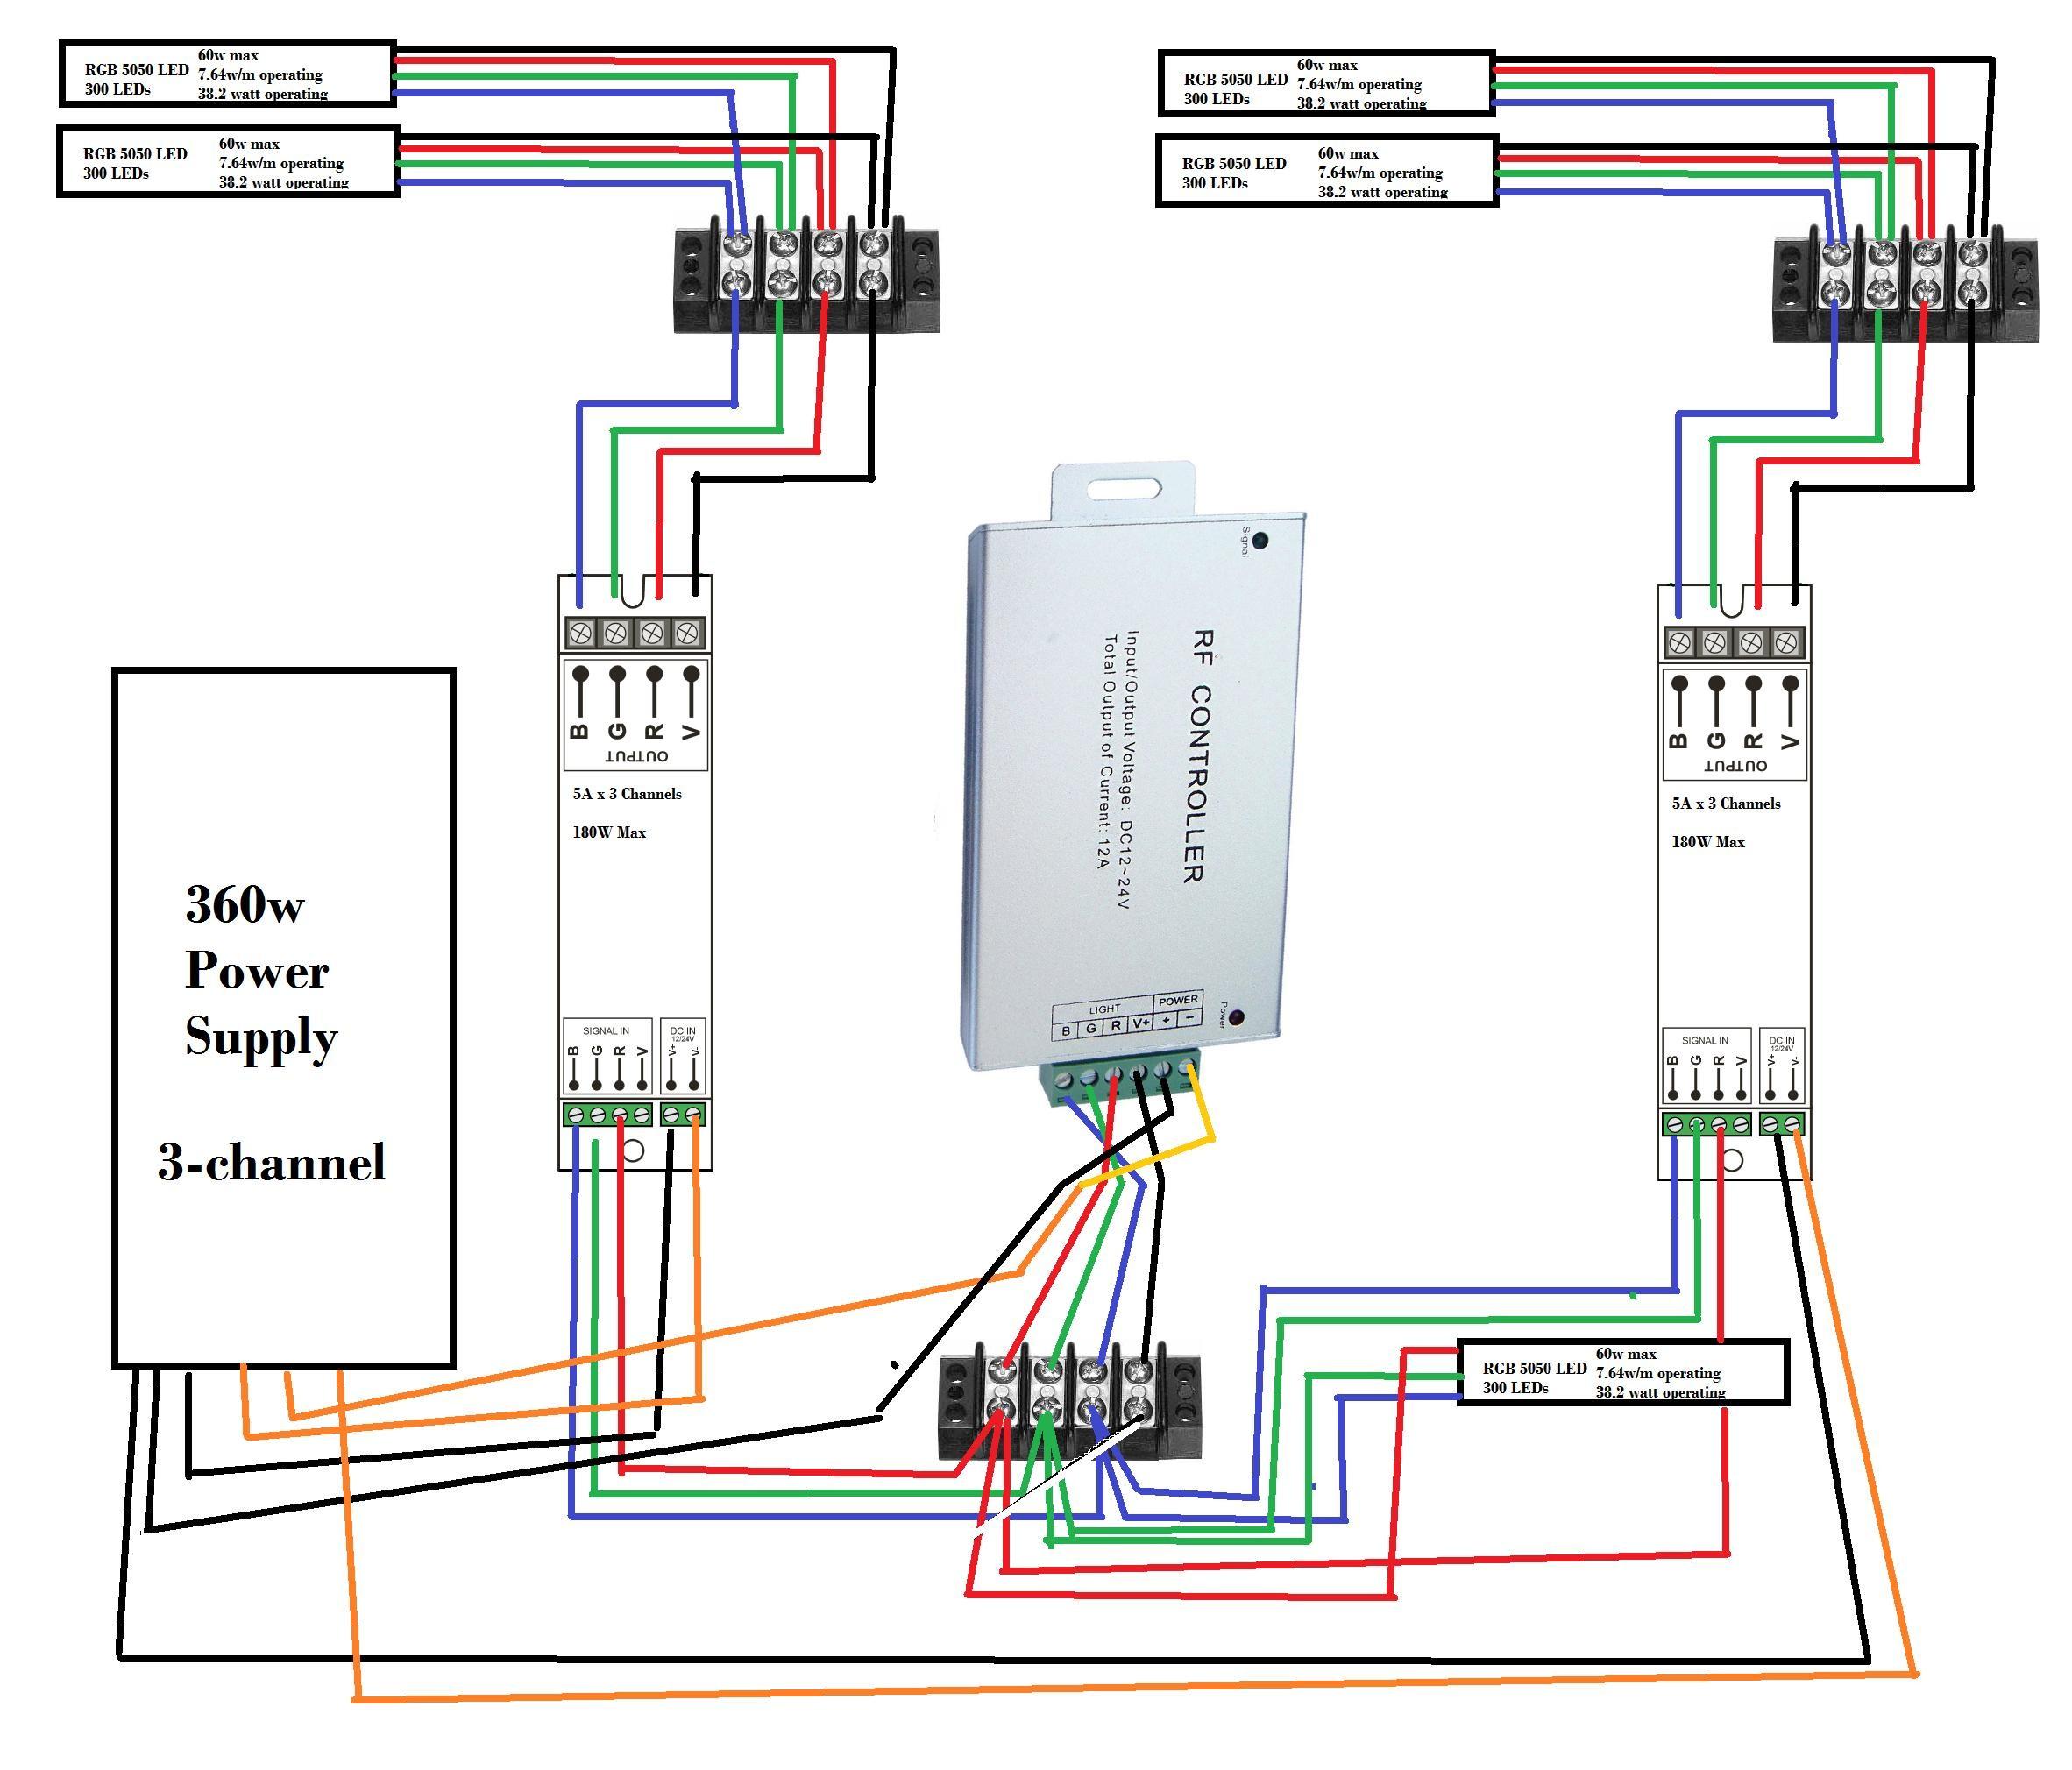 Rgb led wiring diagram unique wiring diagram image wiring diagram rgb led strip controller circuit y8k8m within light swarovskicordoba Gallery